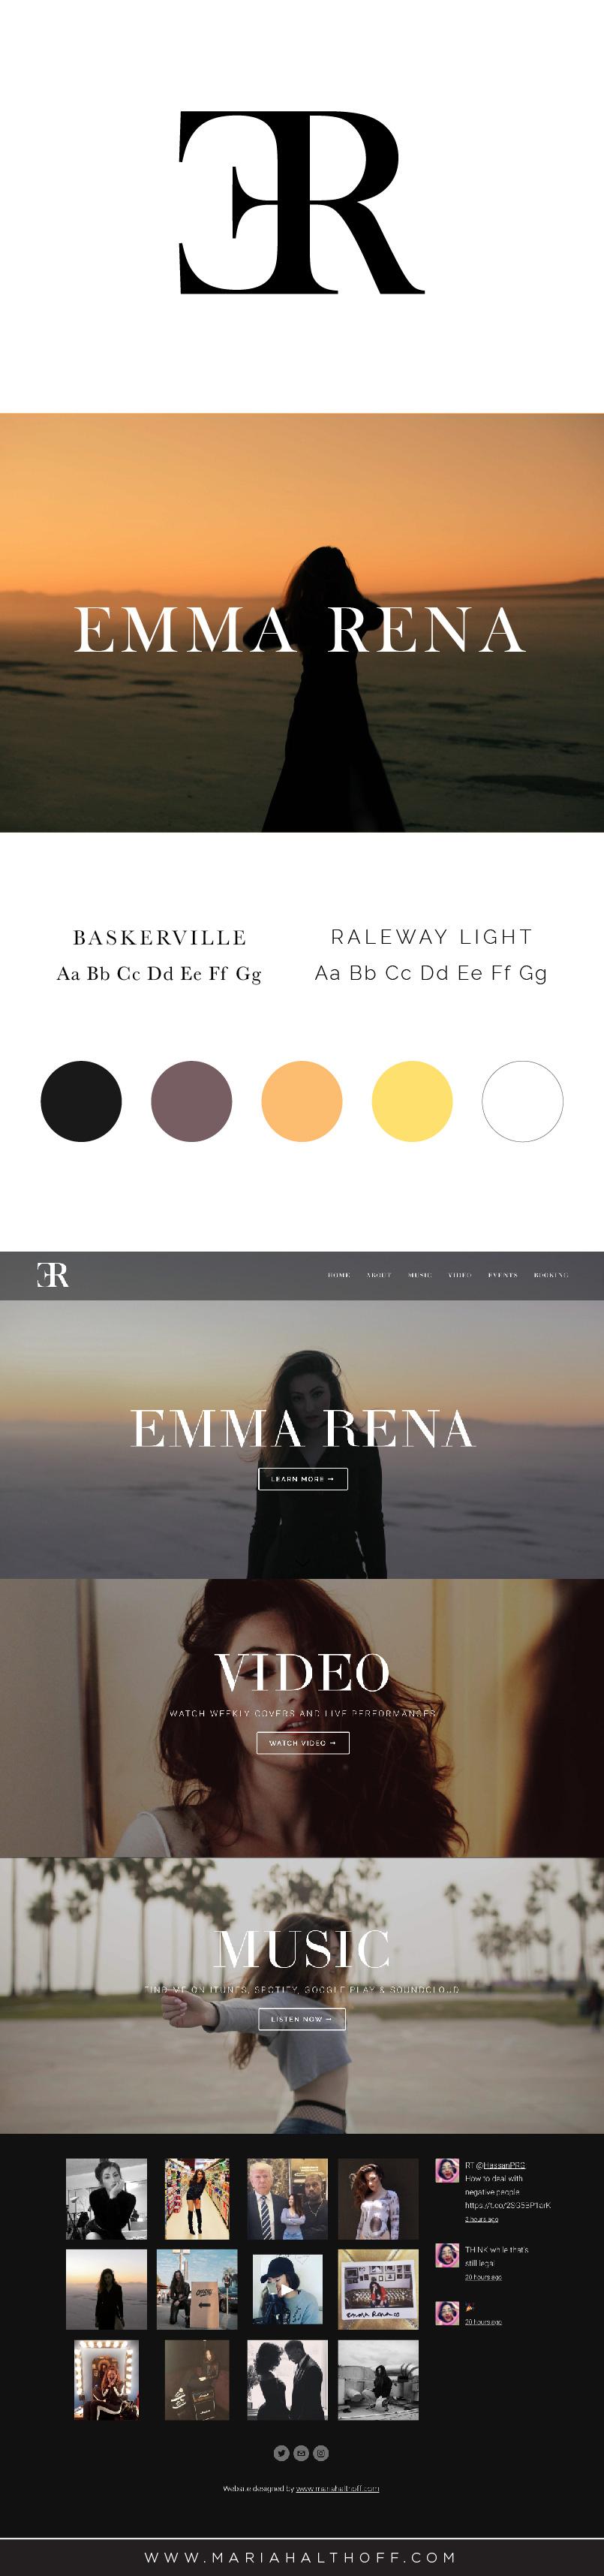 Logo, Branding and Website design, classic, modern, grunge, dark branding with Squarespace website design.